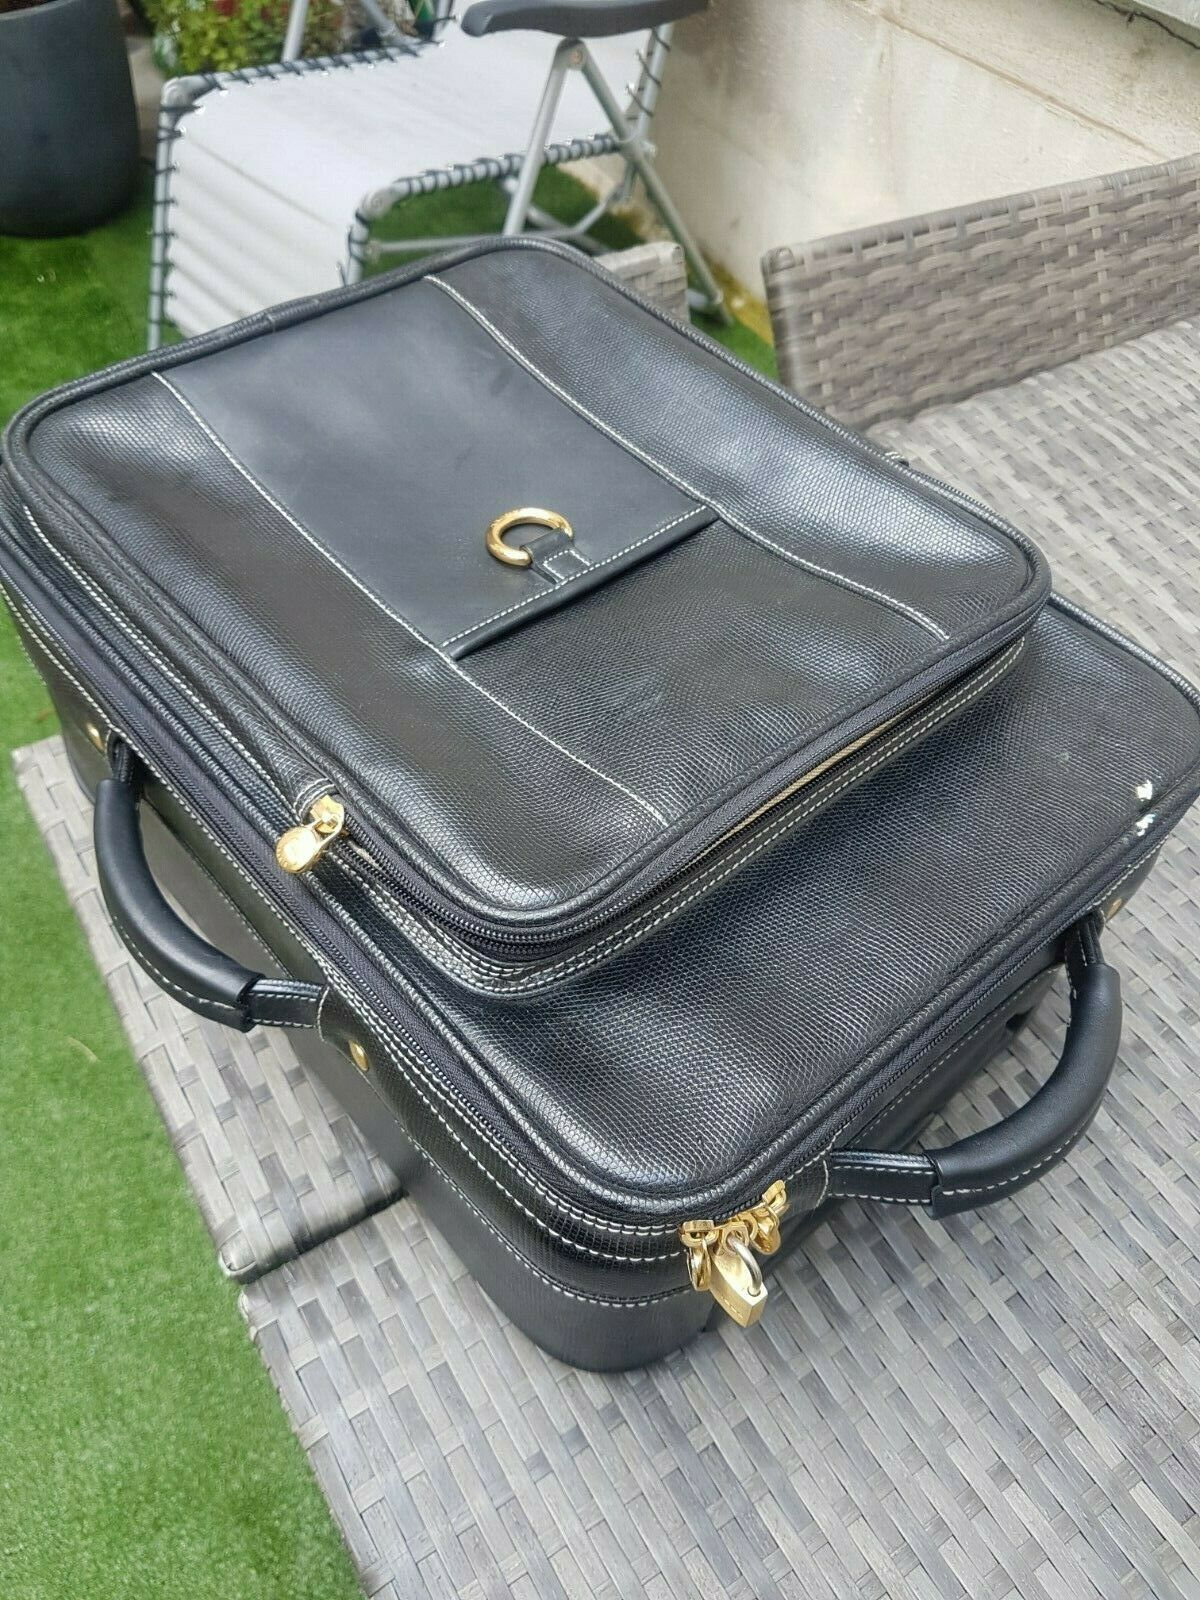 Lancel - Valise Trolley Cabine schwarz Bagage